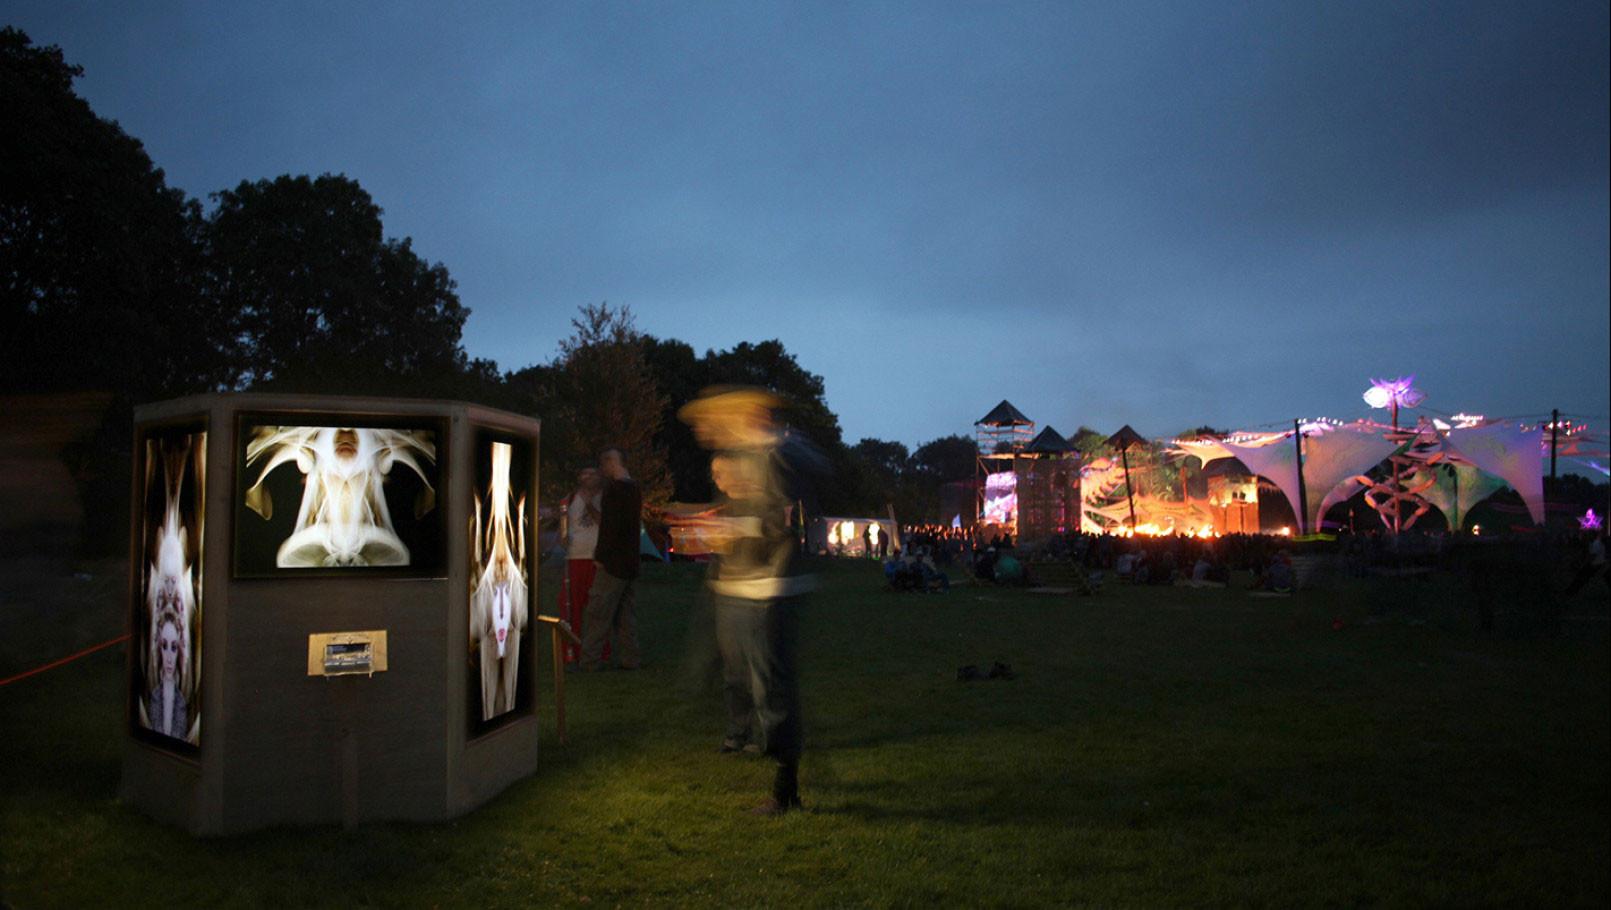 Psy-Fi festival 2014 - Art installation - www.psy-fi.nl